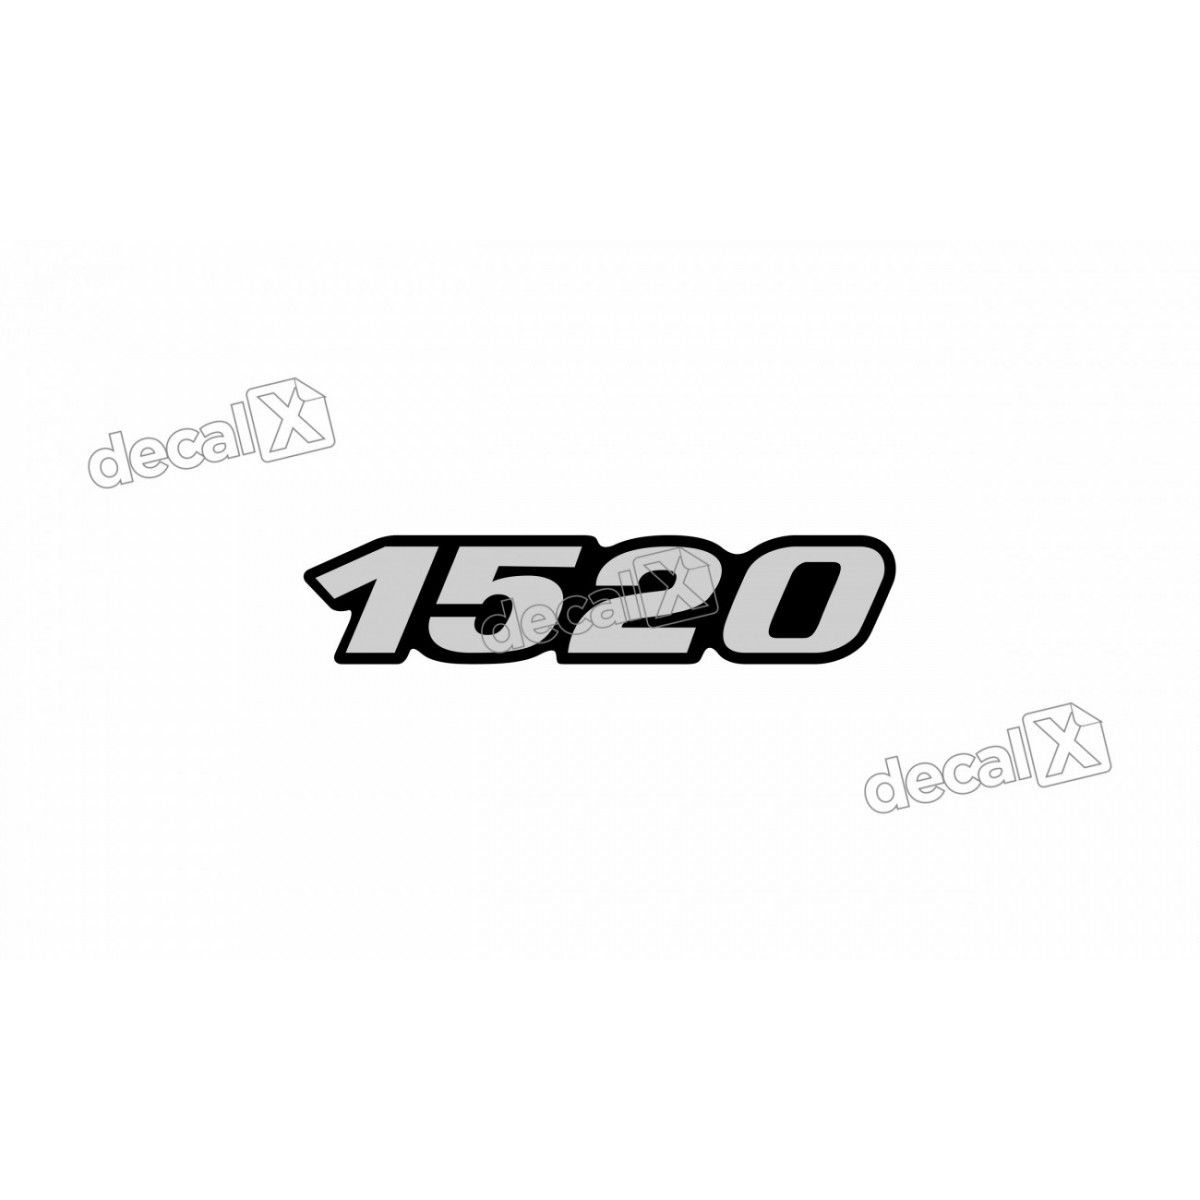 Adesivo Emblema Resinado Mercedes 1520 Cm39 Decalx